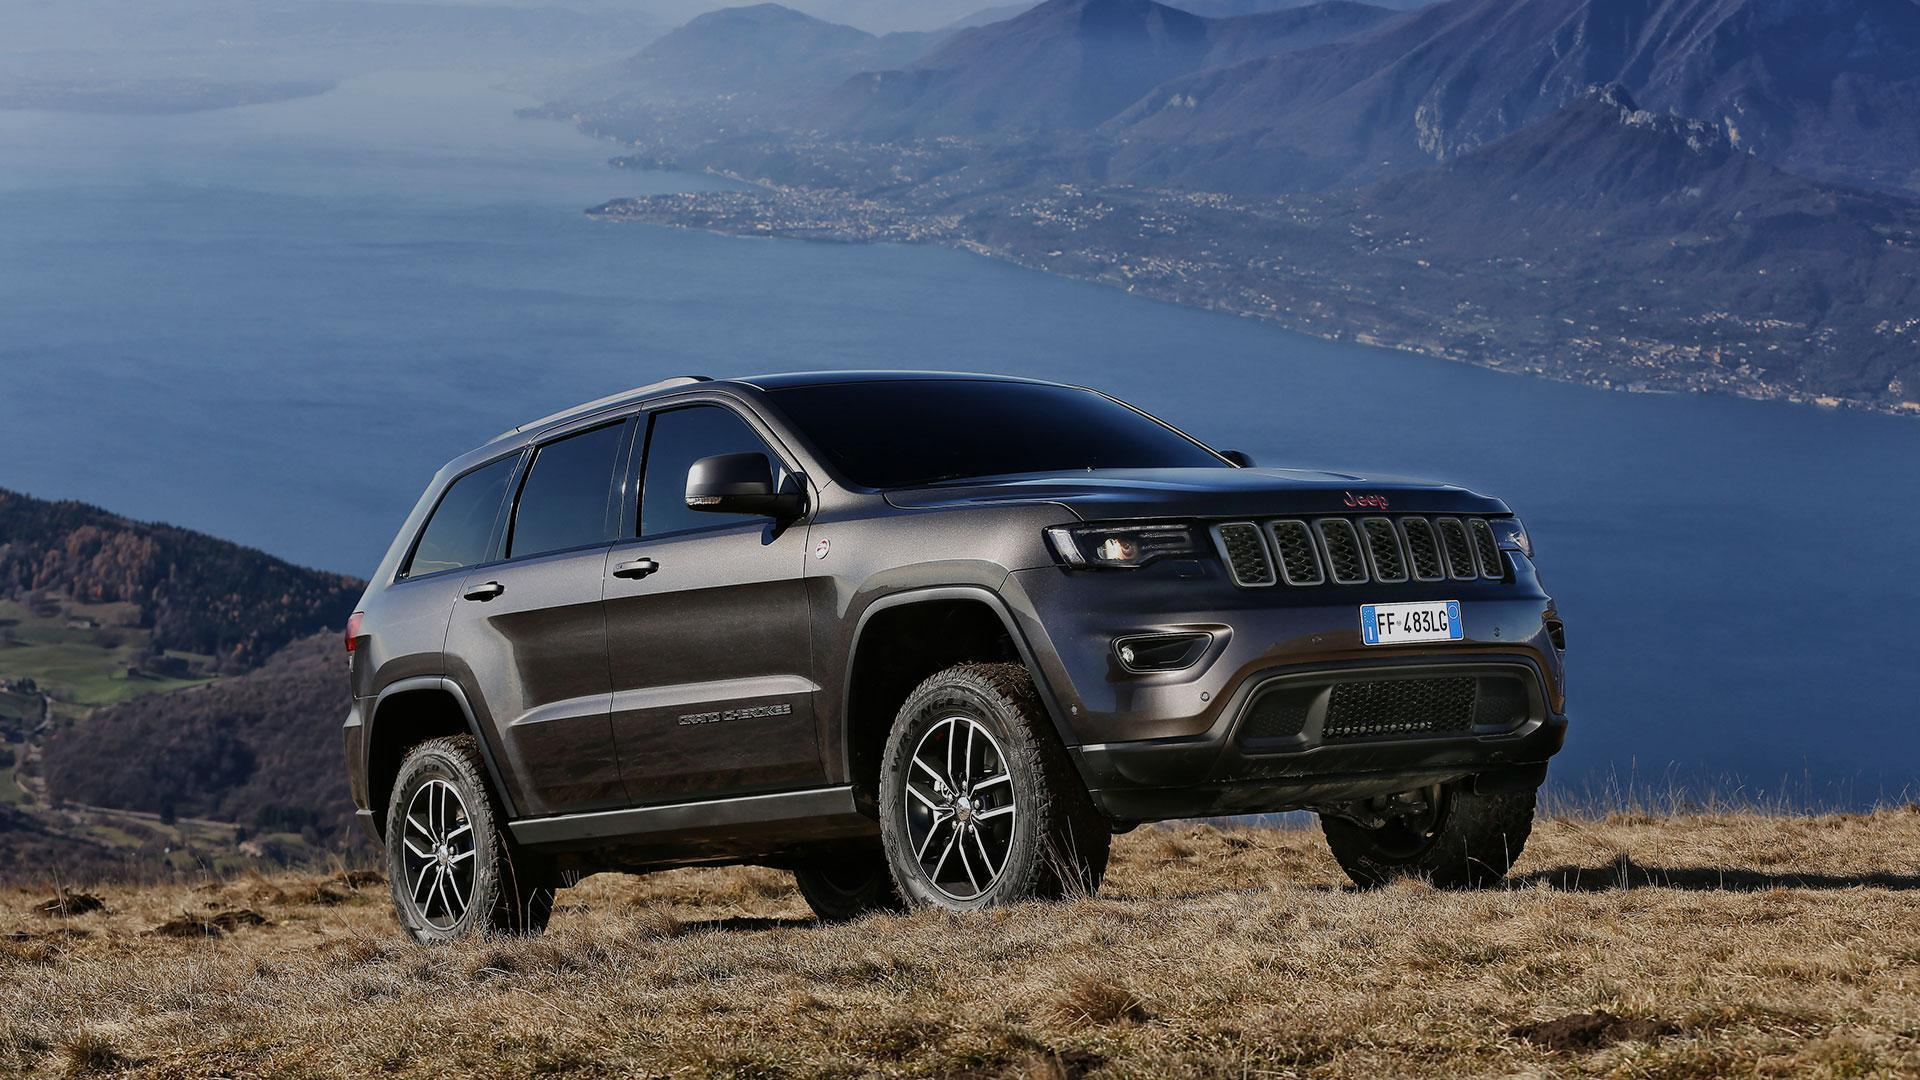 Jeep Grand Cherokee » Auto kuća - KOLE